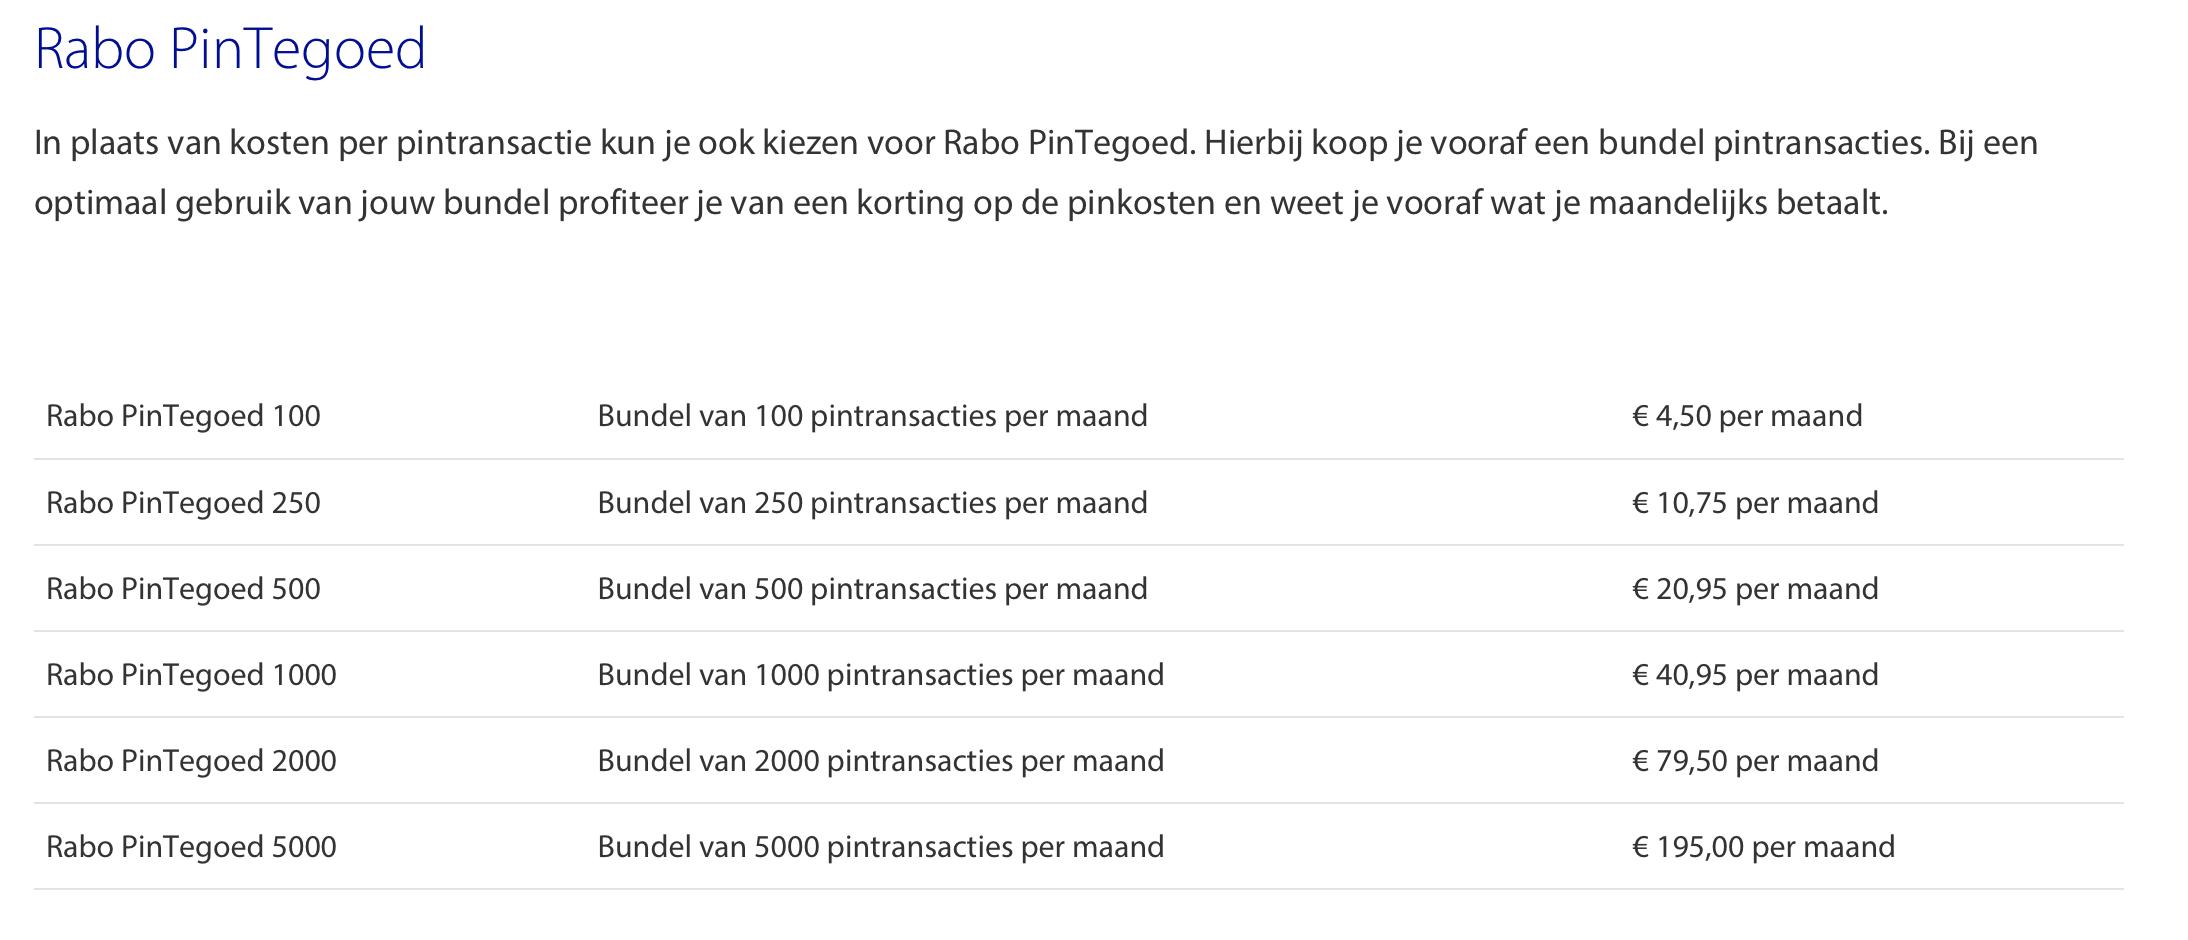 Kosten Rabo PinTegoed bundel